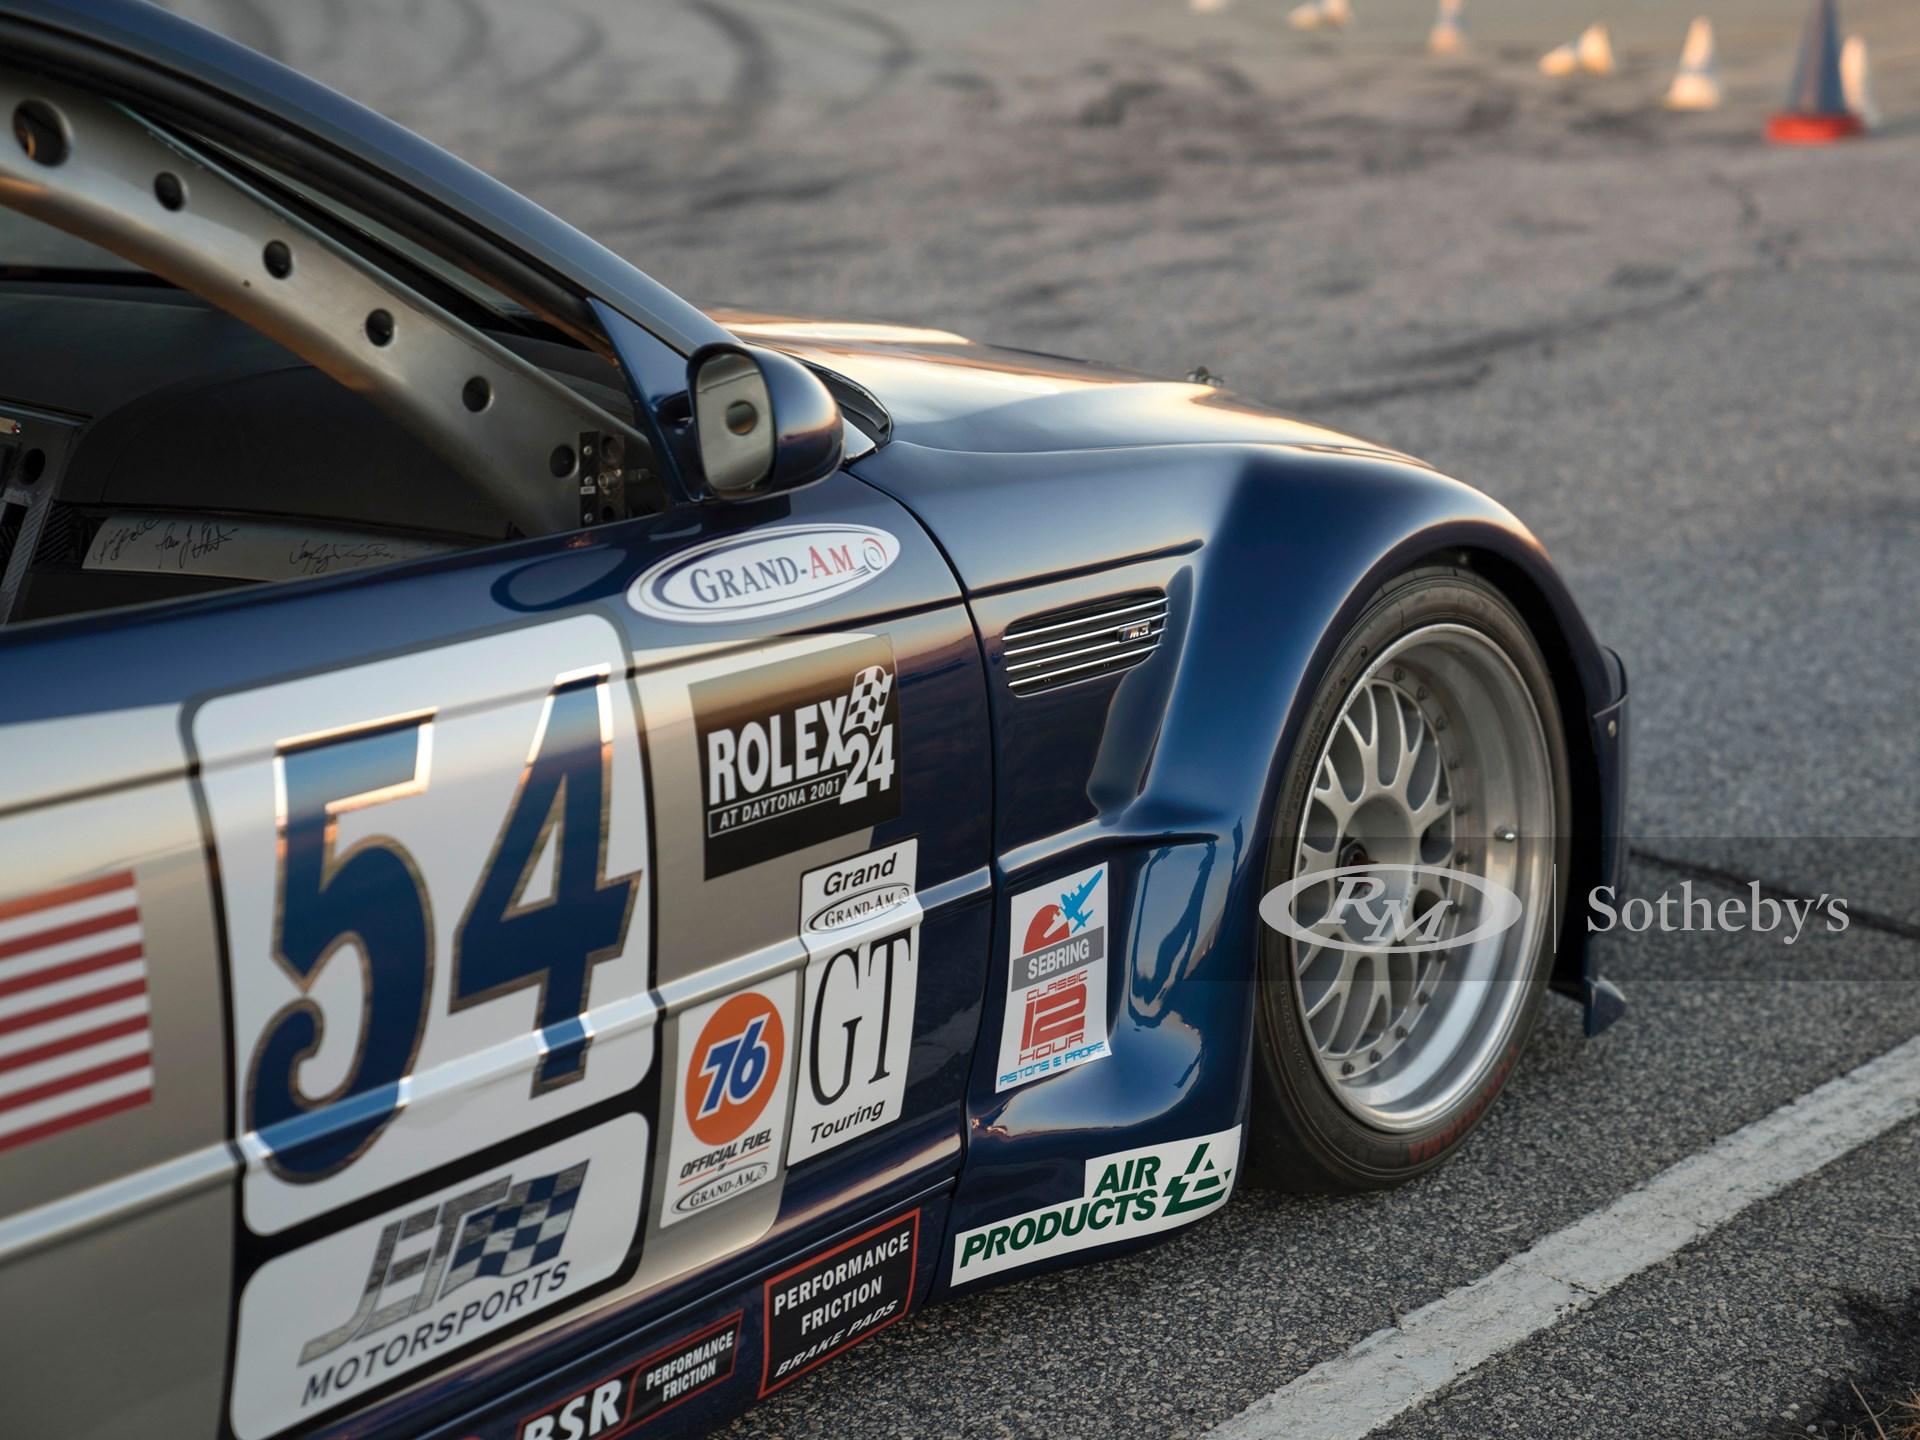 2001 BMW PTG M3 GT V8 Grand-Am  -